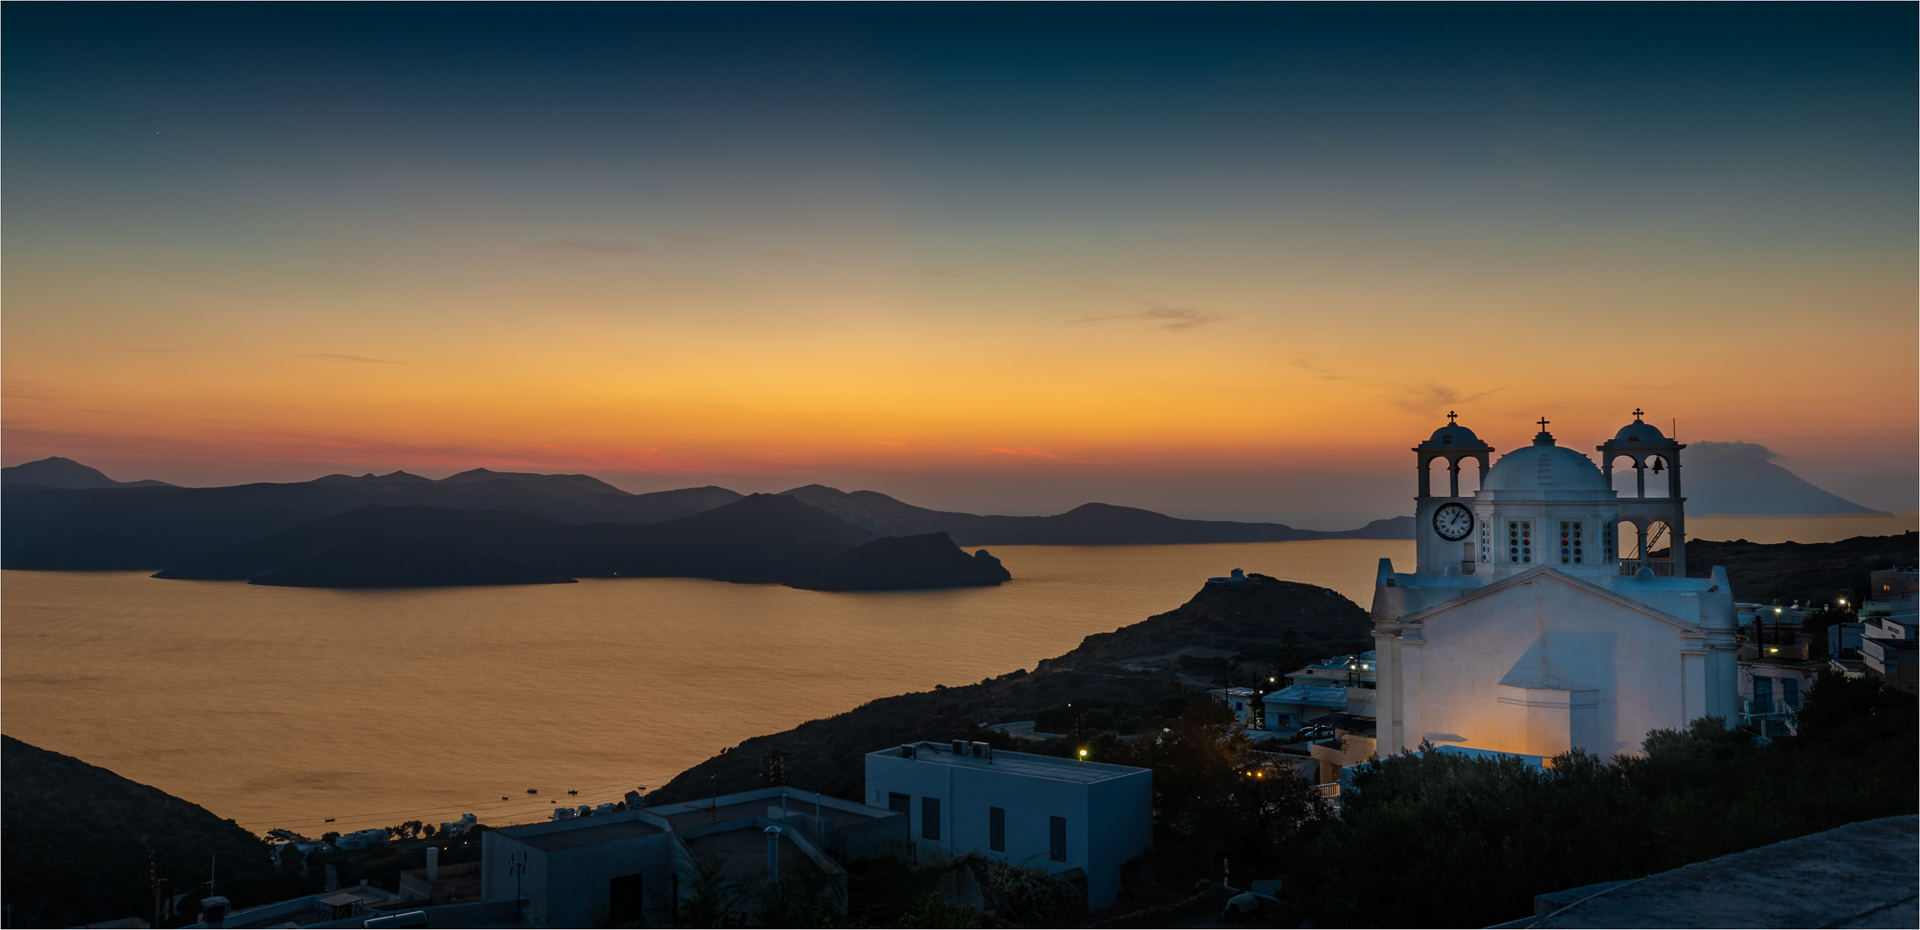 Open_Evening Serenity-Milos, Greece_Ray Shorter_Agr_Honour